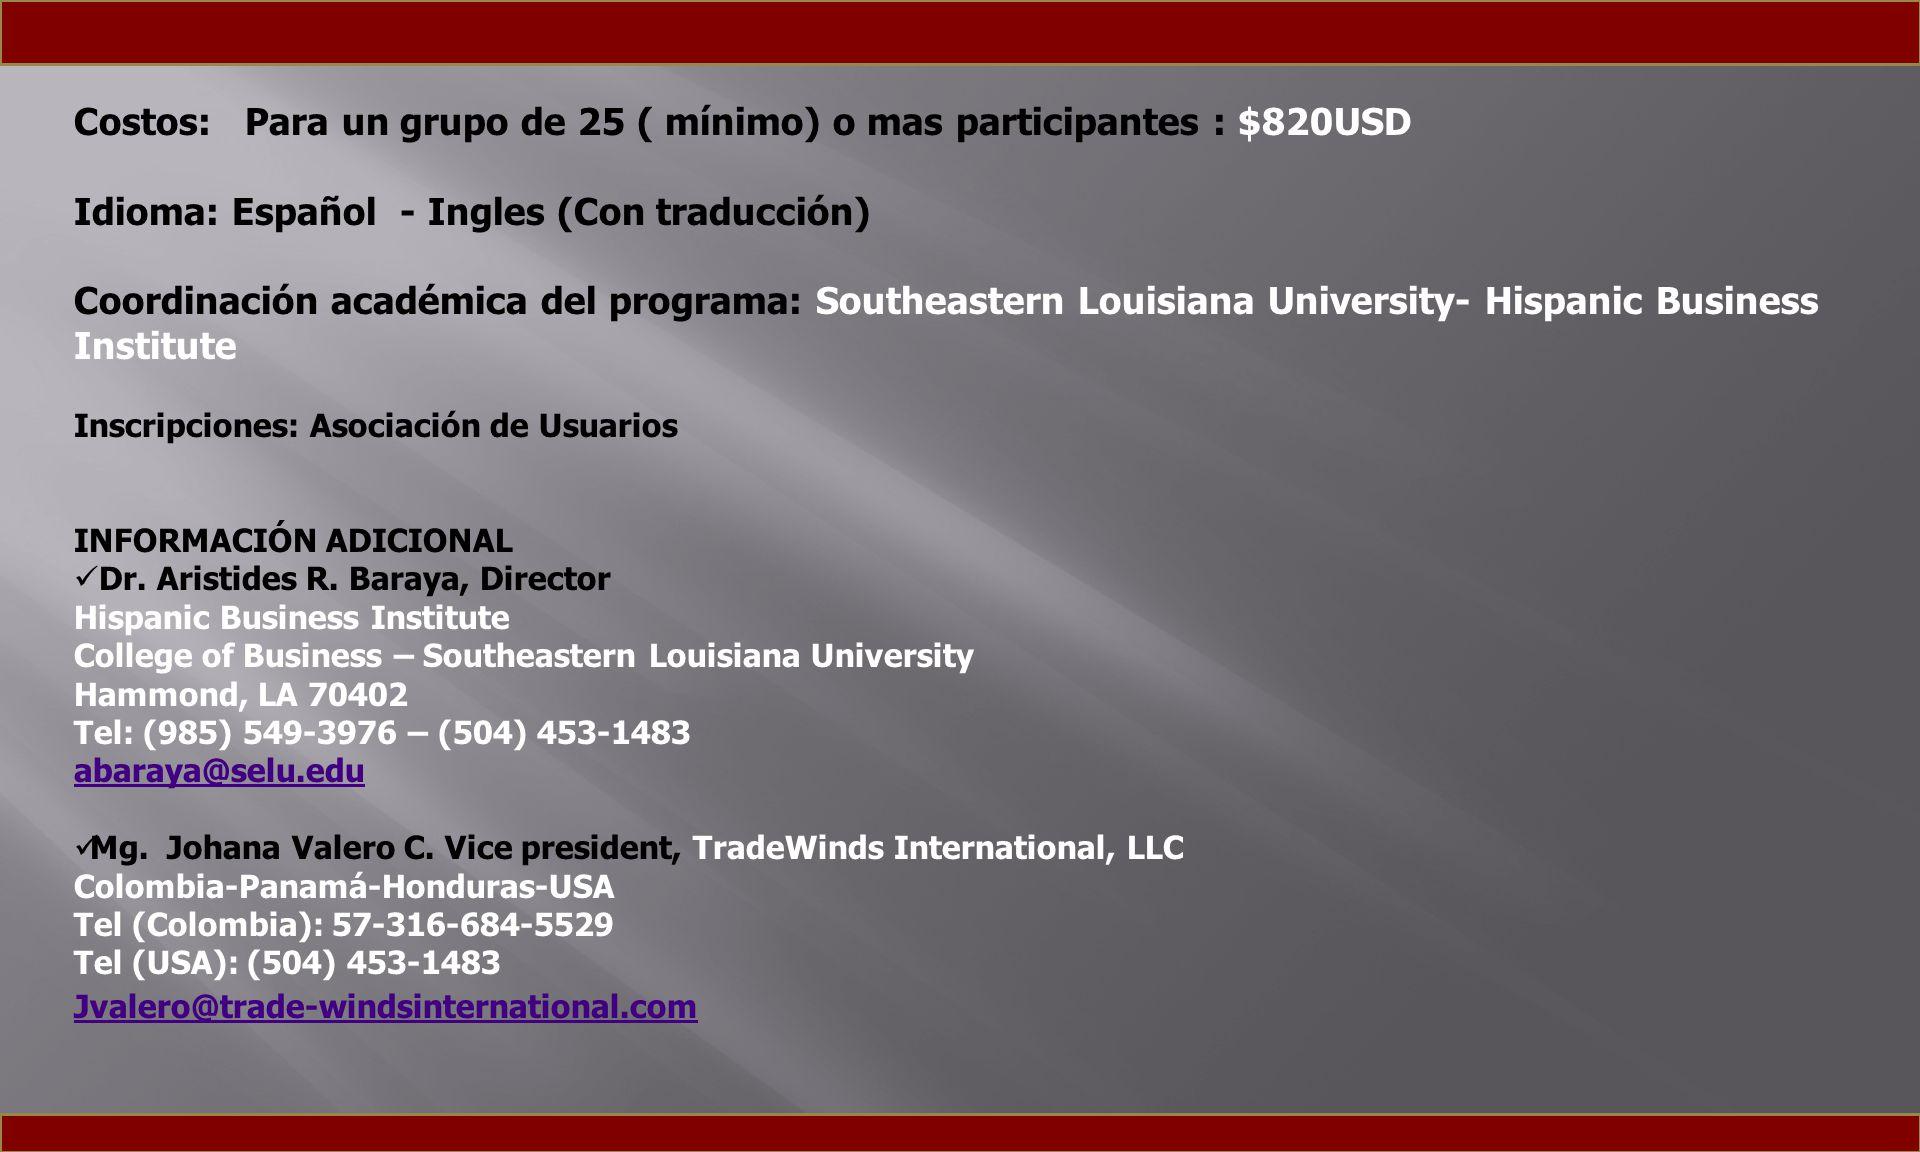 Costos: Para un grupo de 25 ( mínimo) o mas participantes : $820USD Idioma: Español - Ingles (Con traducción) Coordinación académica del programa: Southeastern Louisiana University- Hispanic Business Institute Inscripciones: Asociación de Usuarios INFORMACIÓN ADICIONAL Dr.